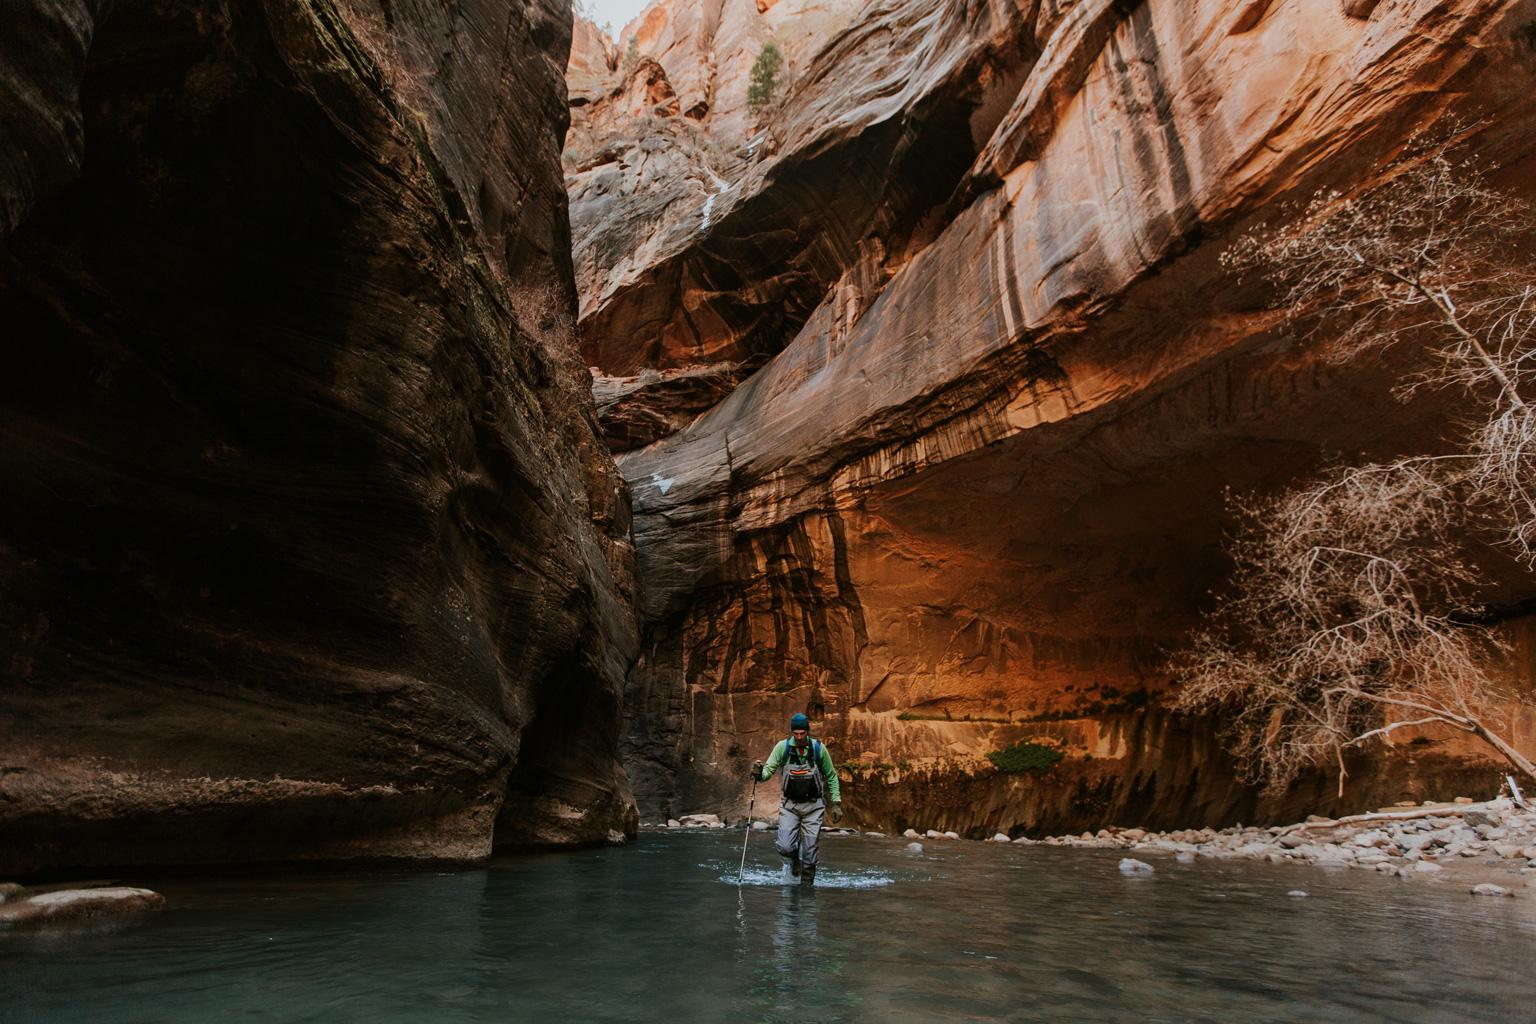 CindyGiovagnoli_Zion_National_Park_Utah_Narrows_hike_winter-003.jpg